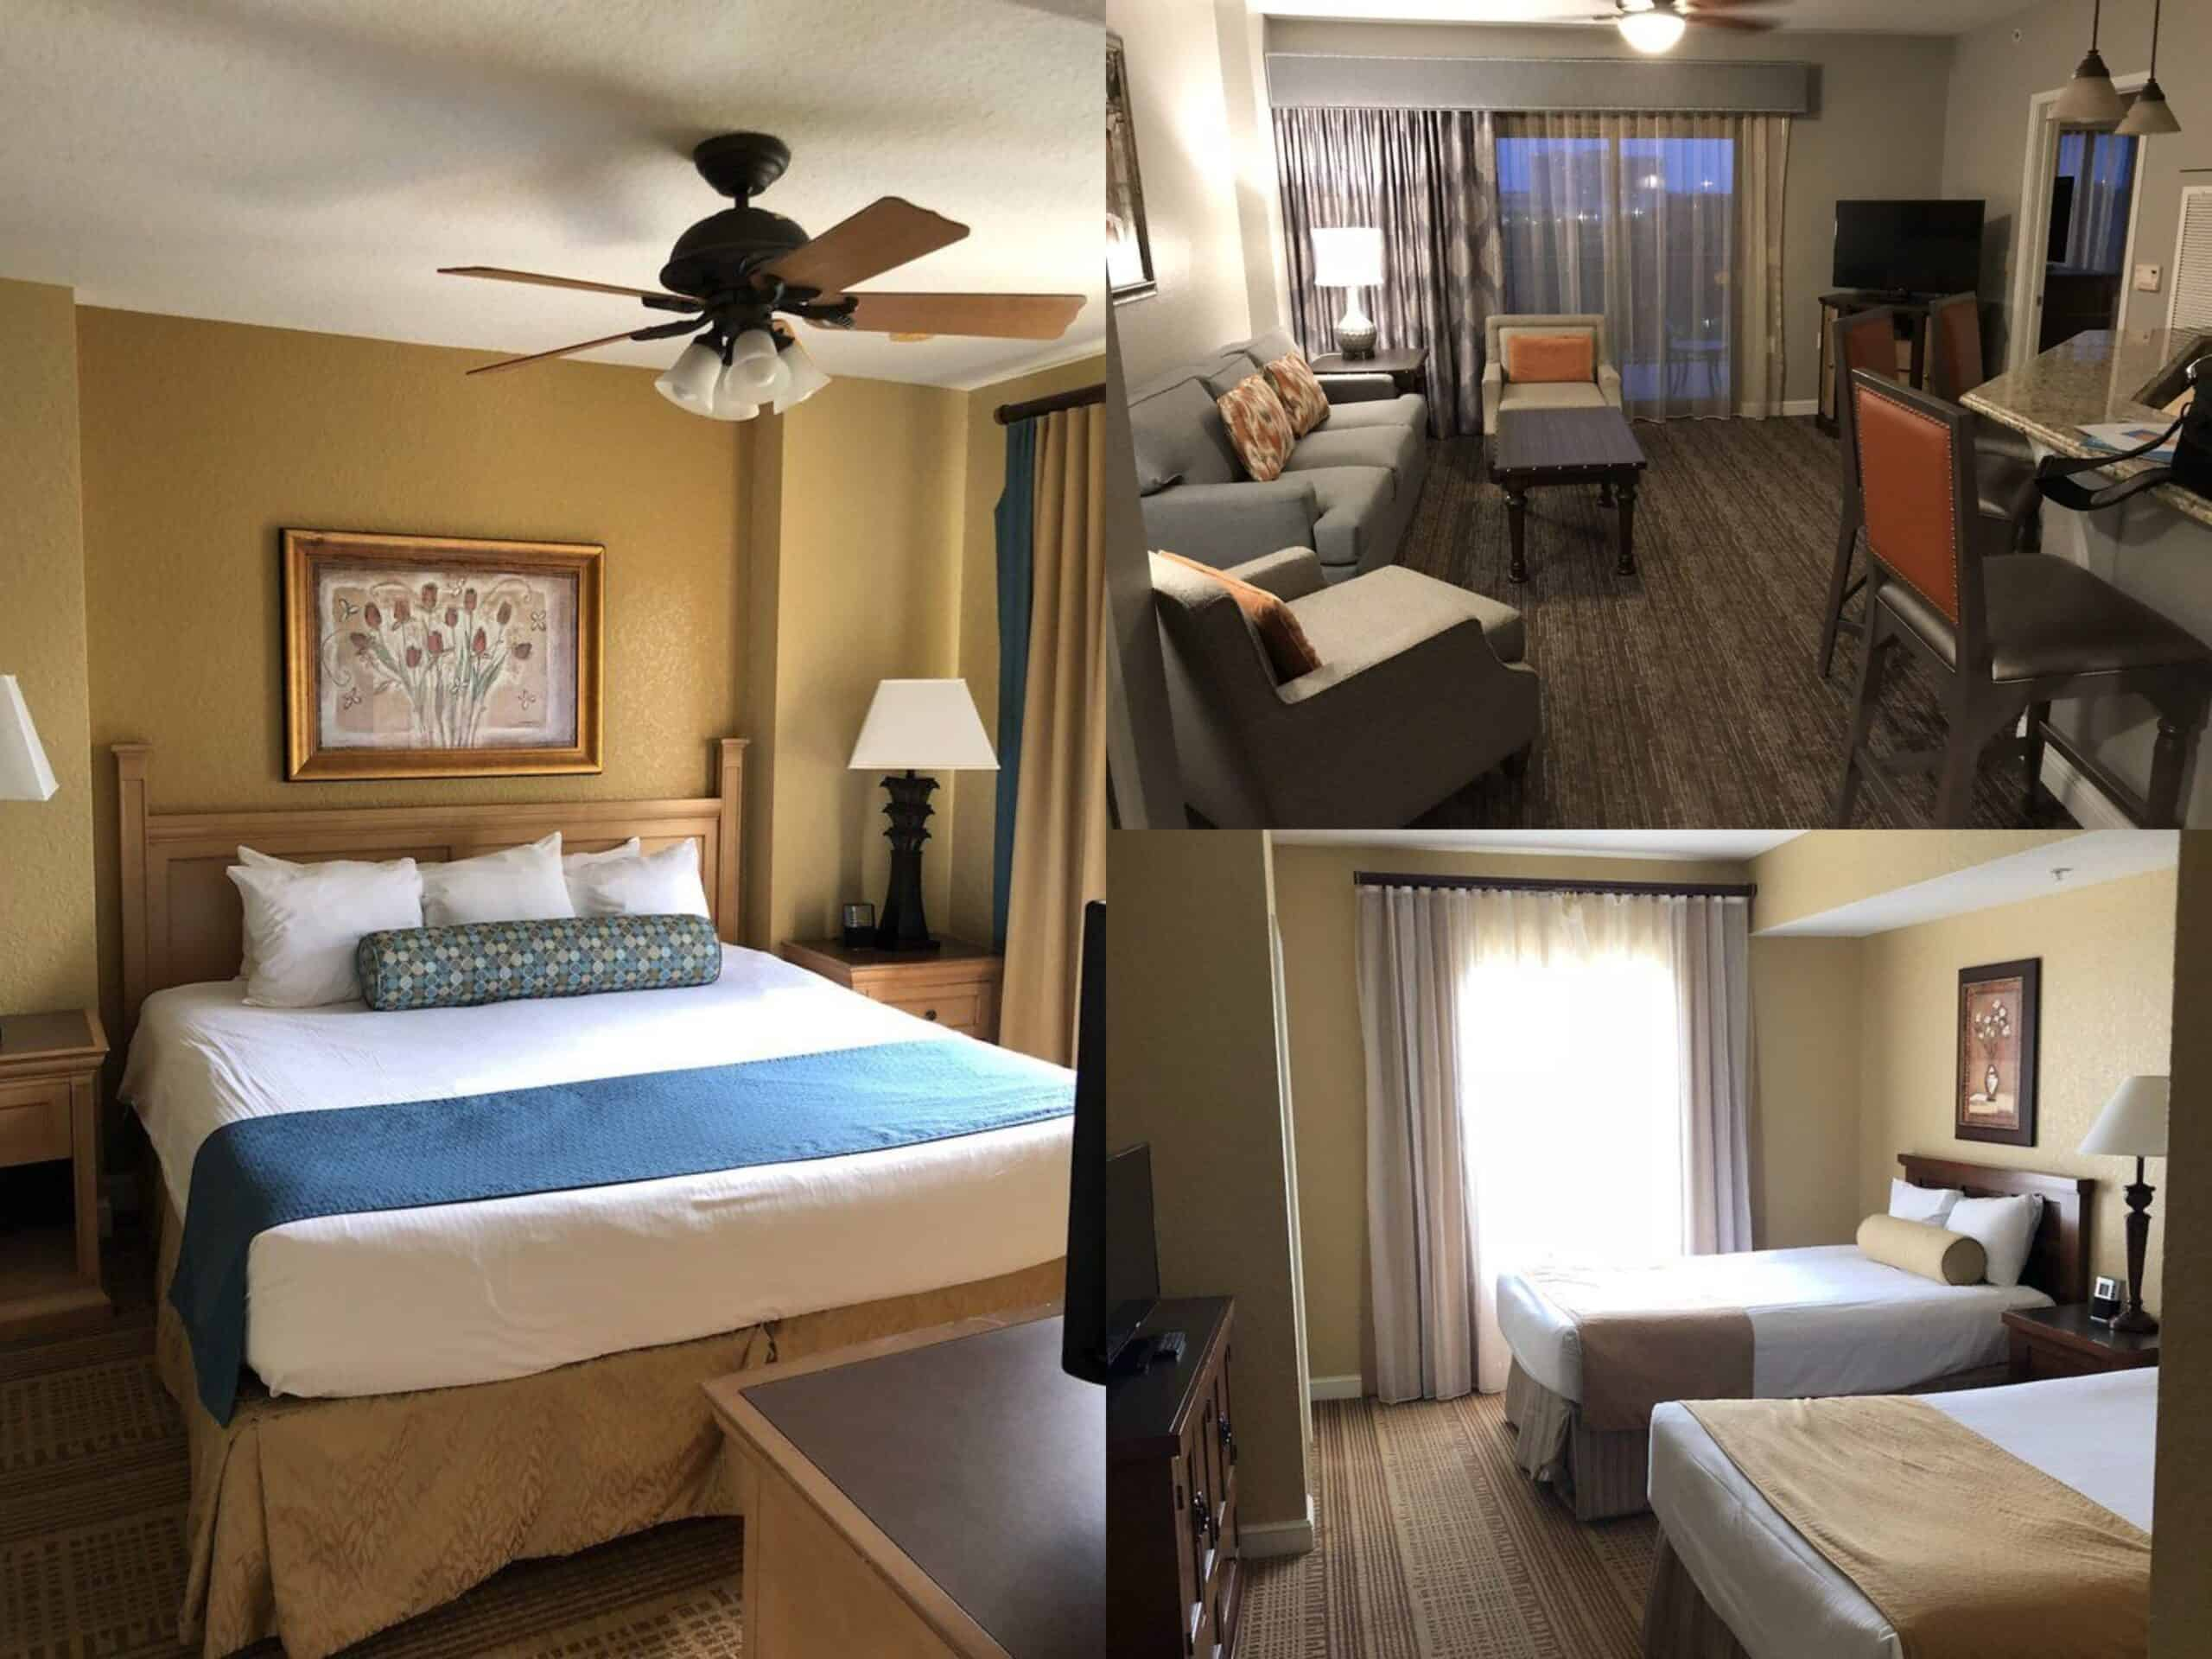 orlando hotels for kids